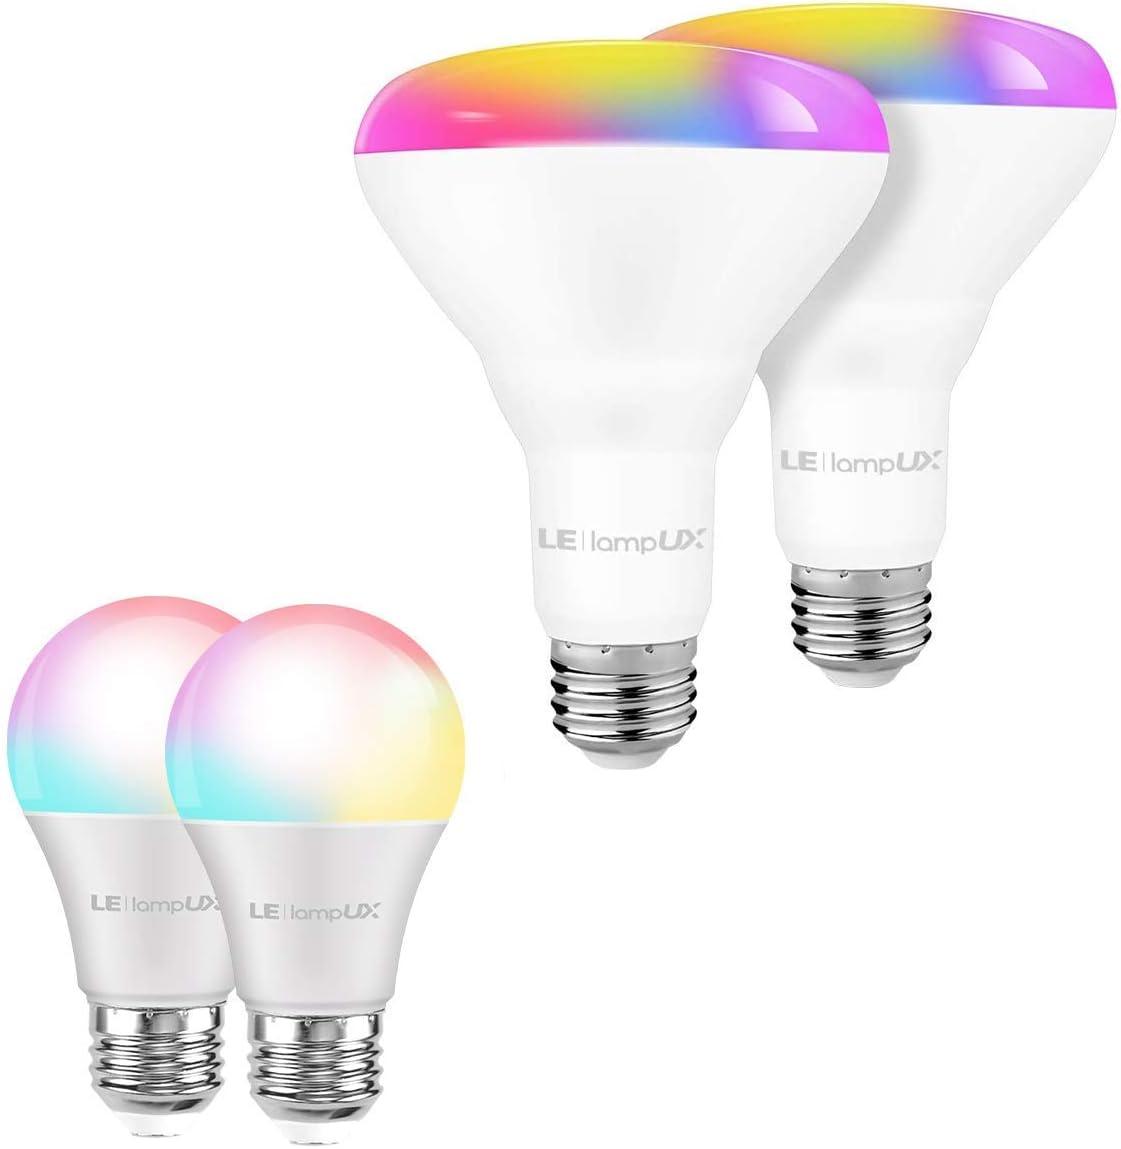 Bundle – 2 Items: A19 E26 Smart Bulbs BR30 Lig Light Topics OFFicial shop on TV